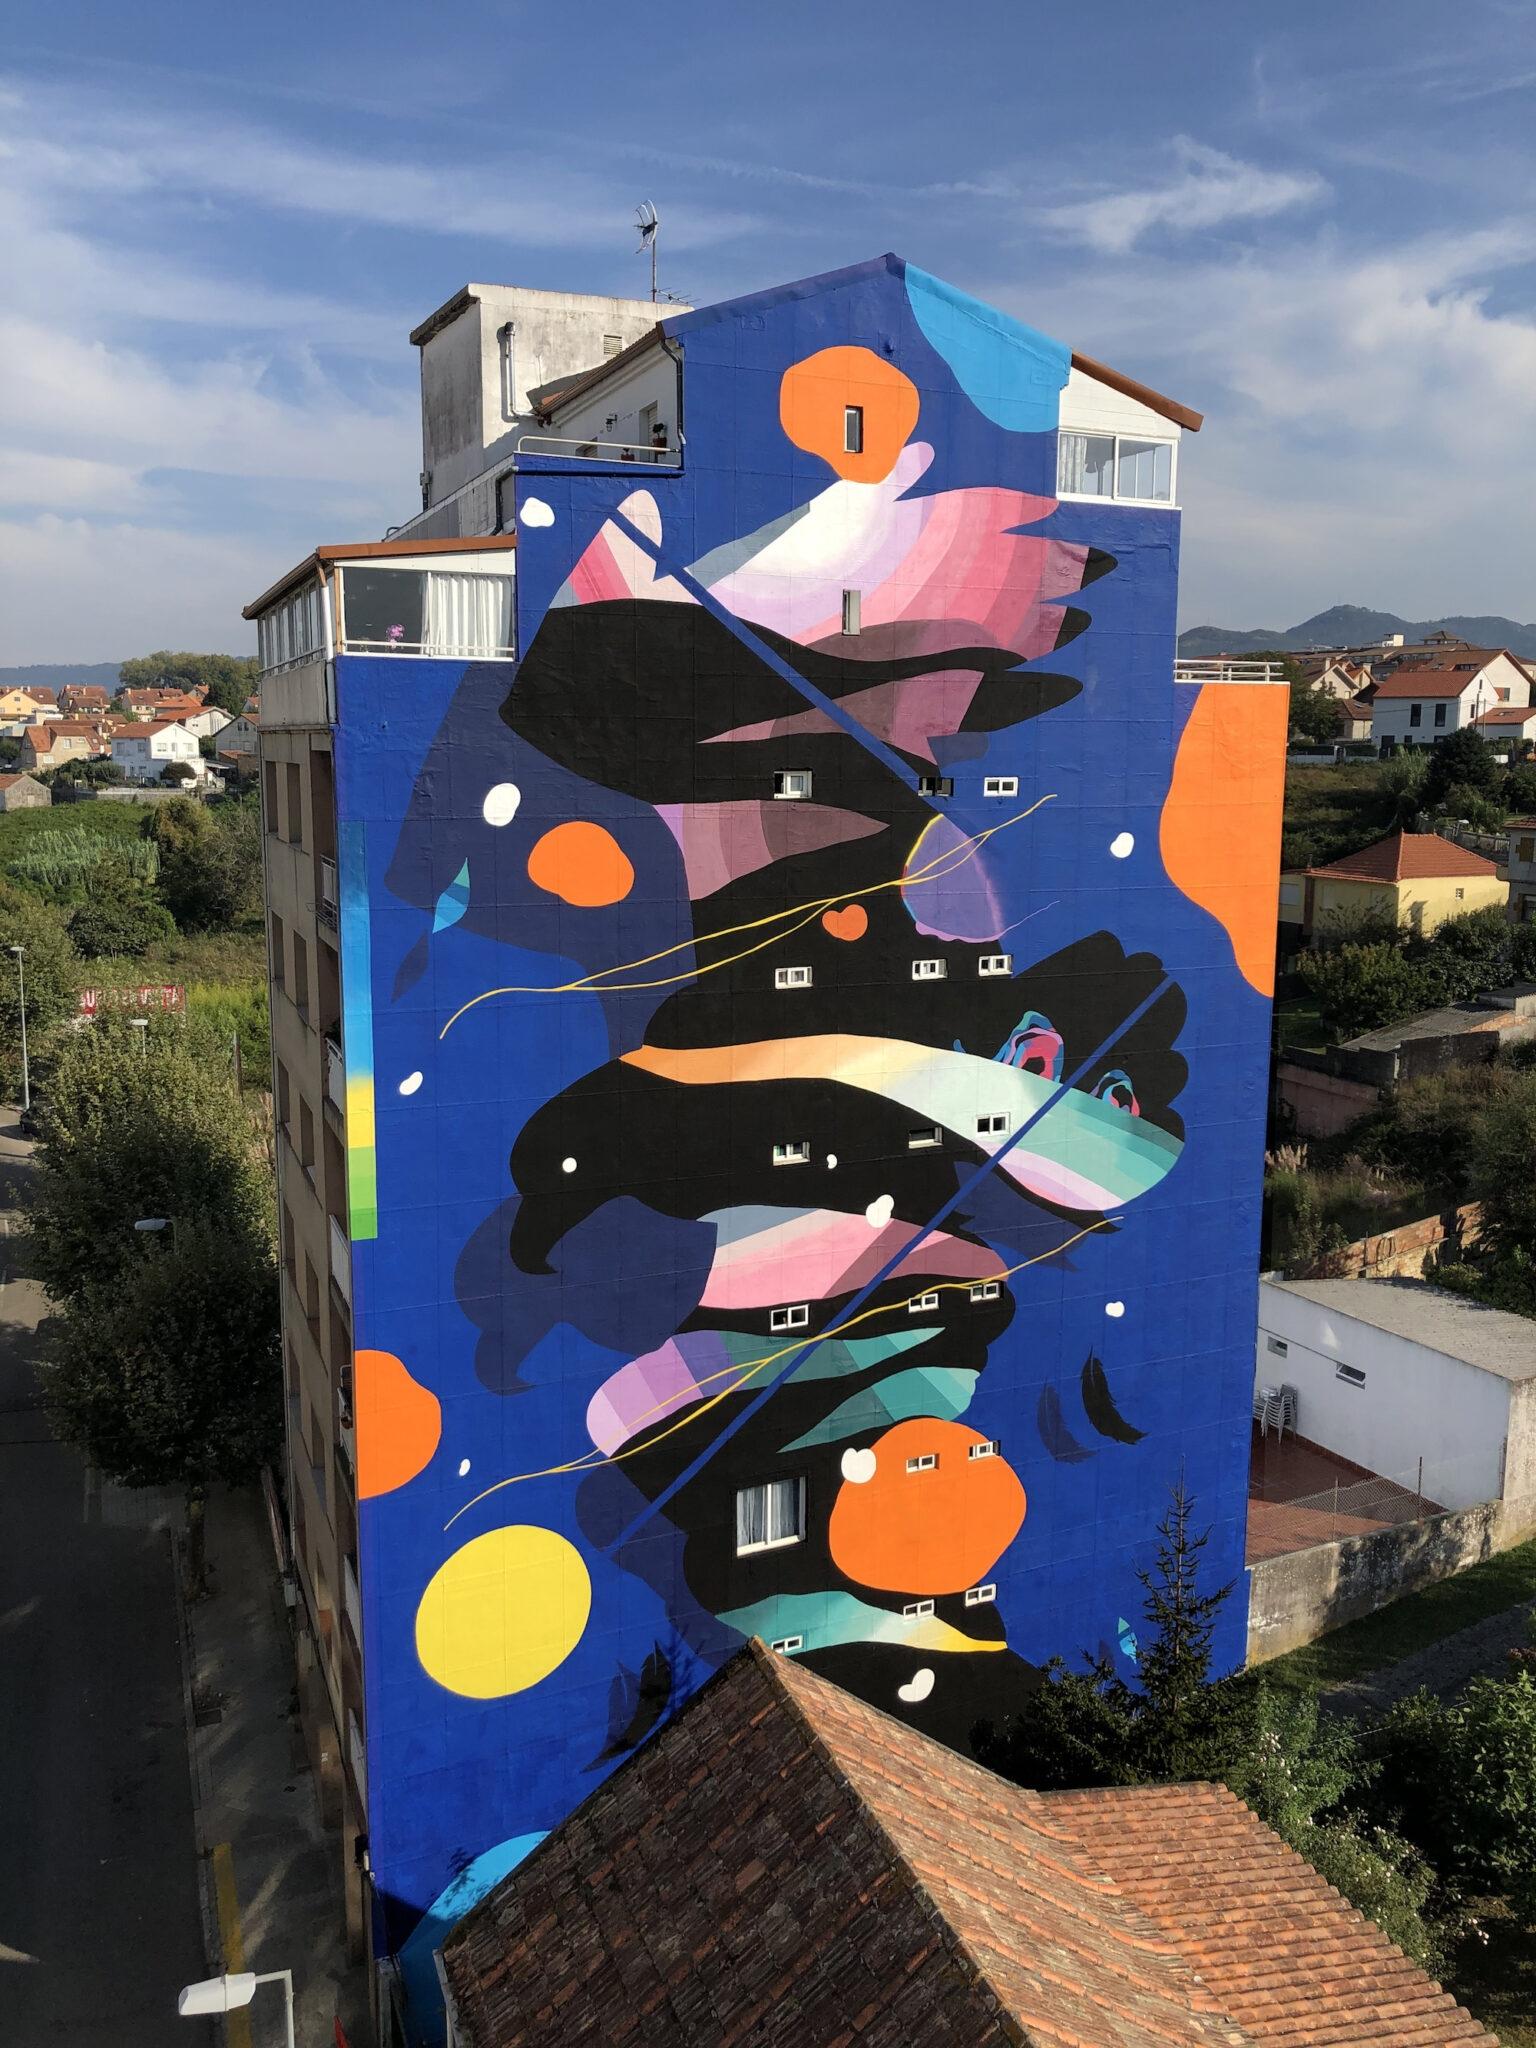 """ANHELO"" by Sabek in Vigo, Spain"